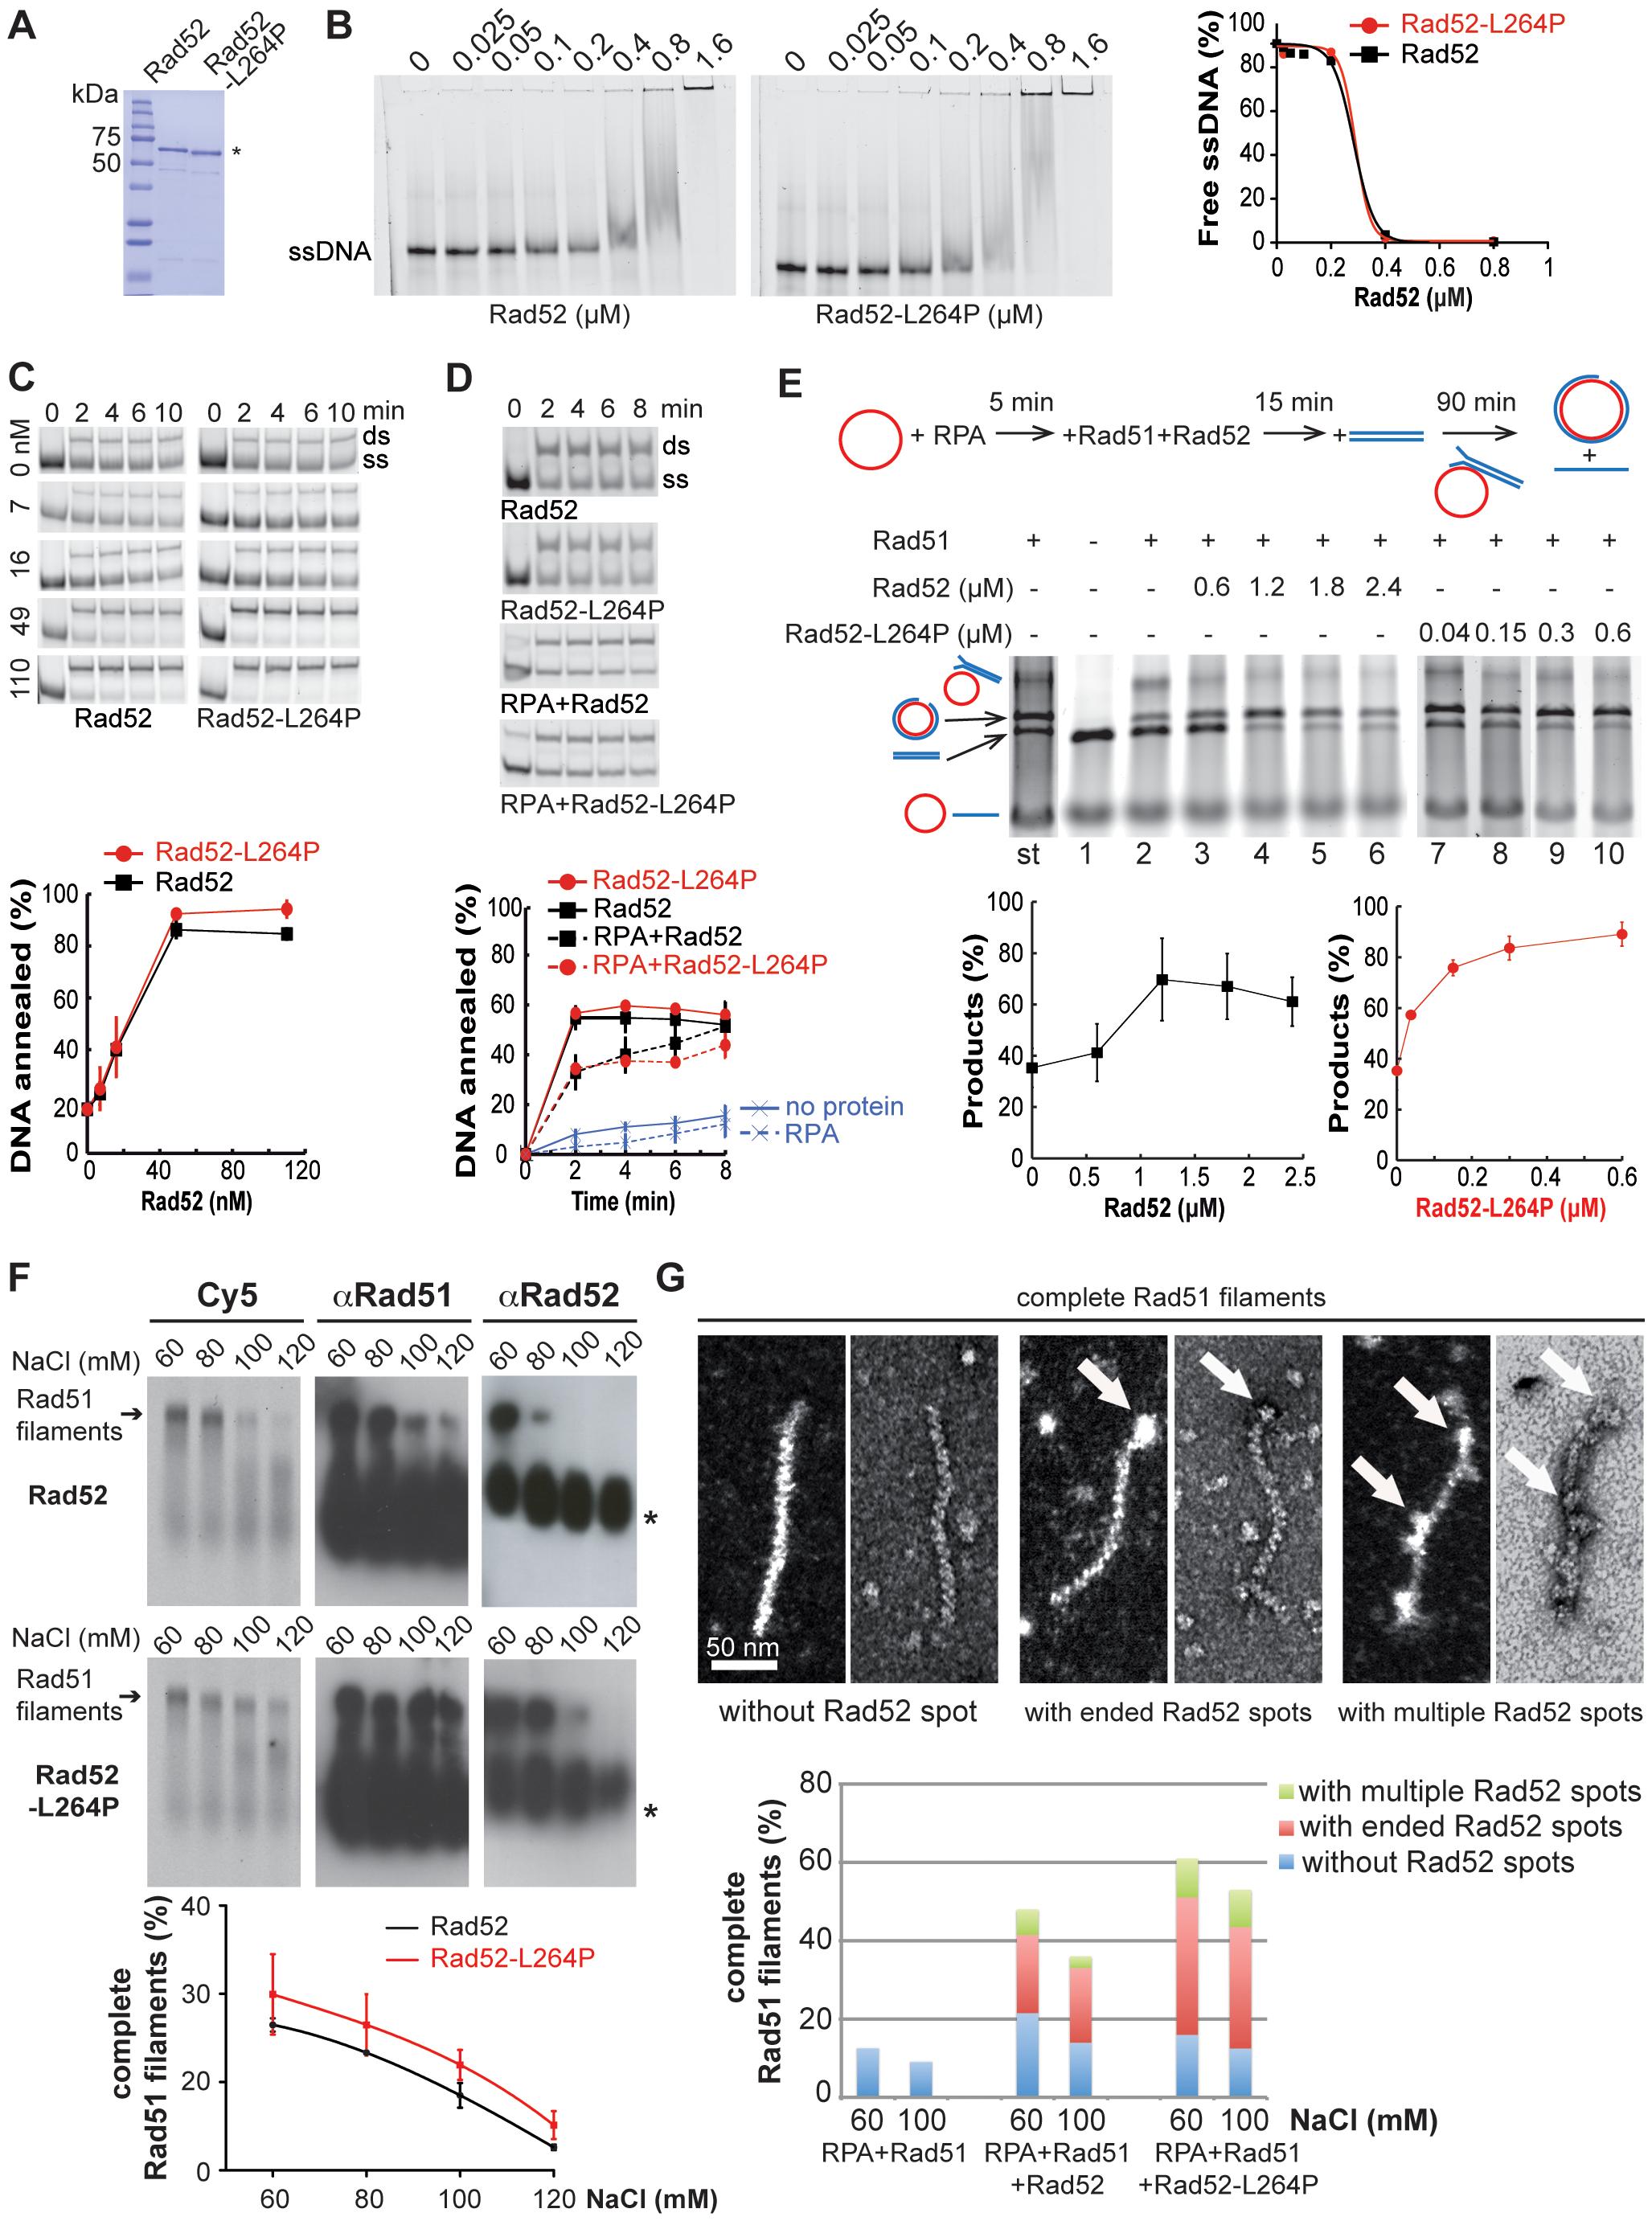 Biochemical analysis of Rad52-L264P-mediated filaments.